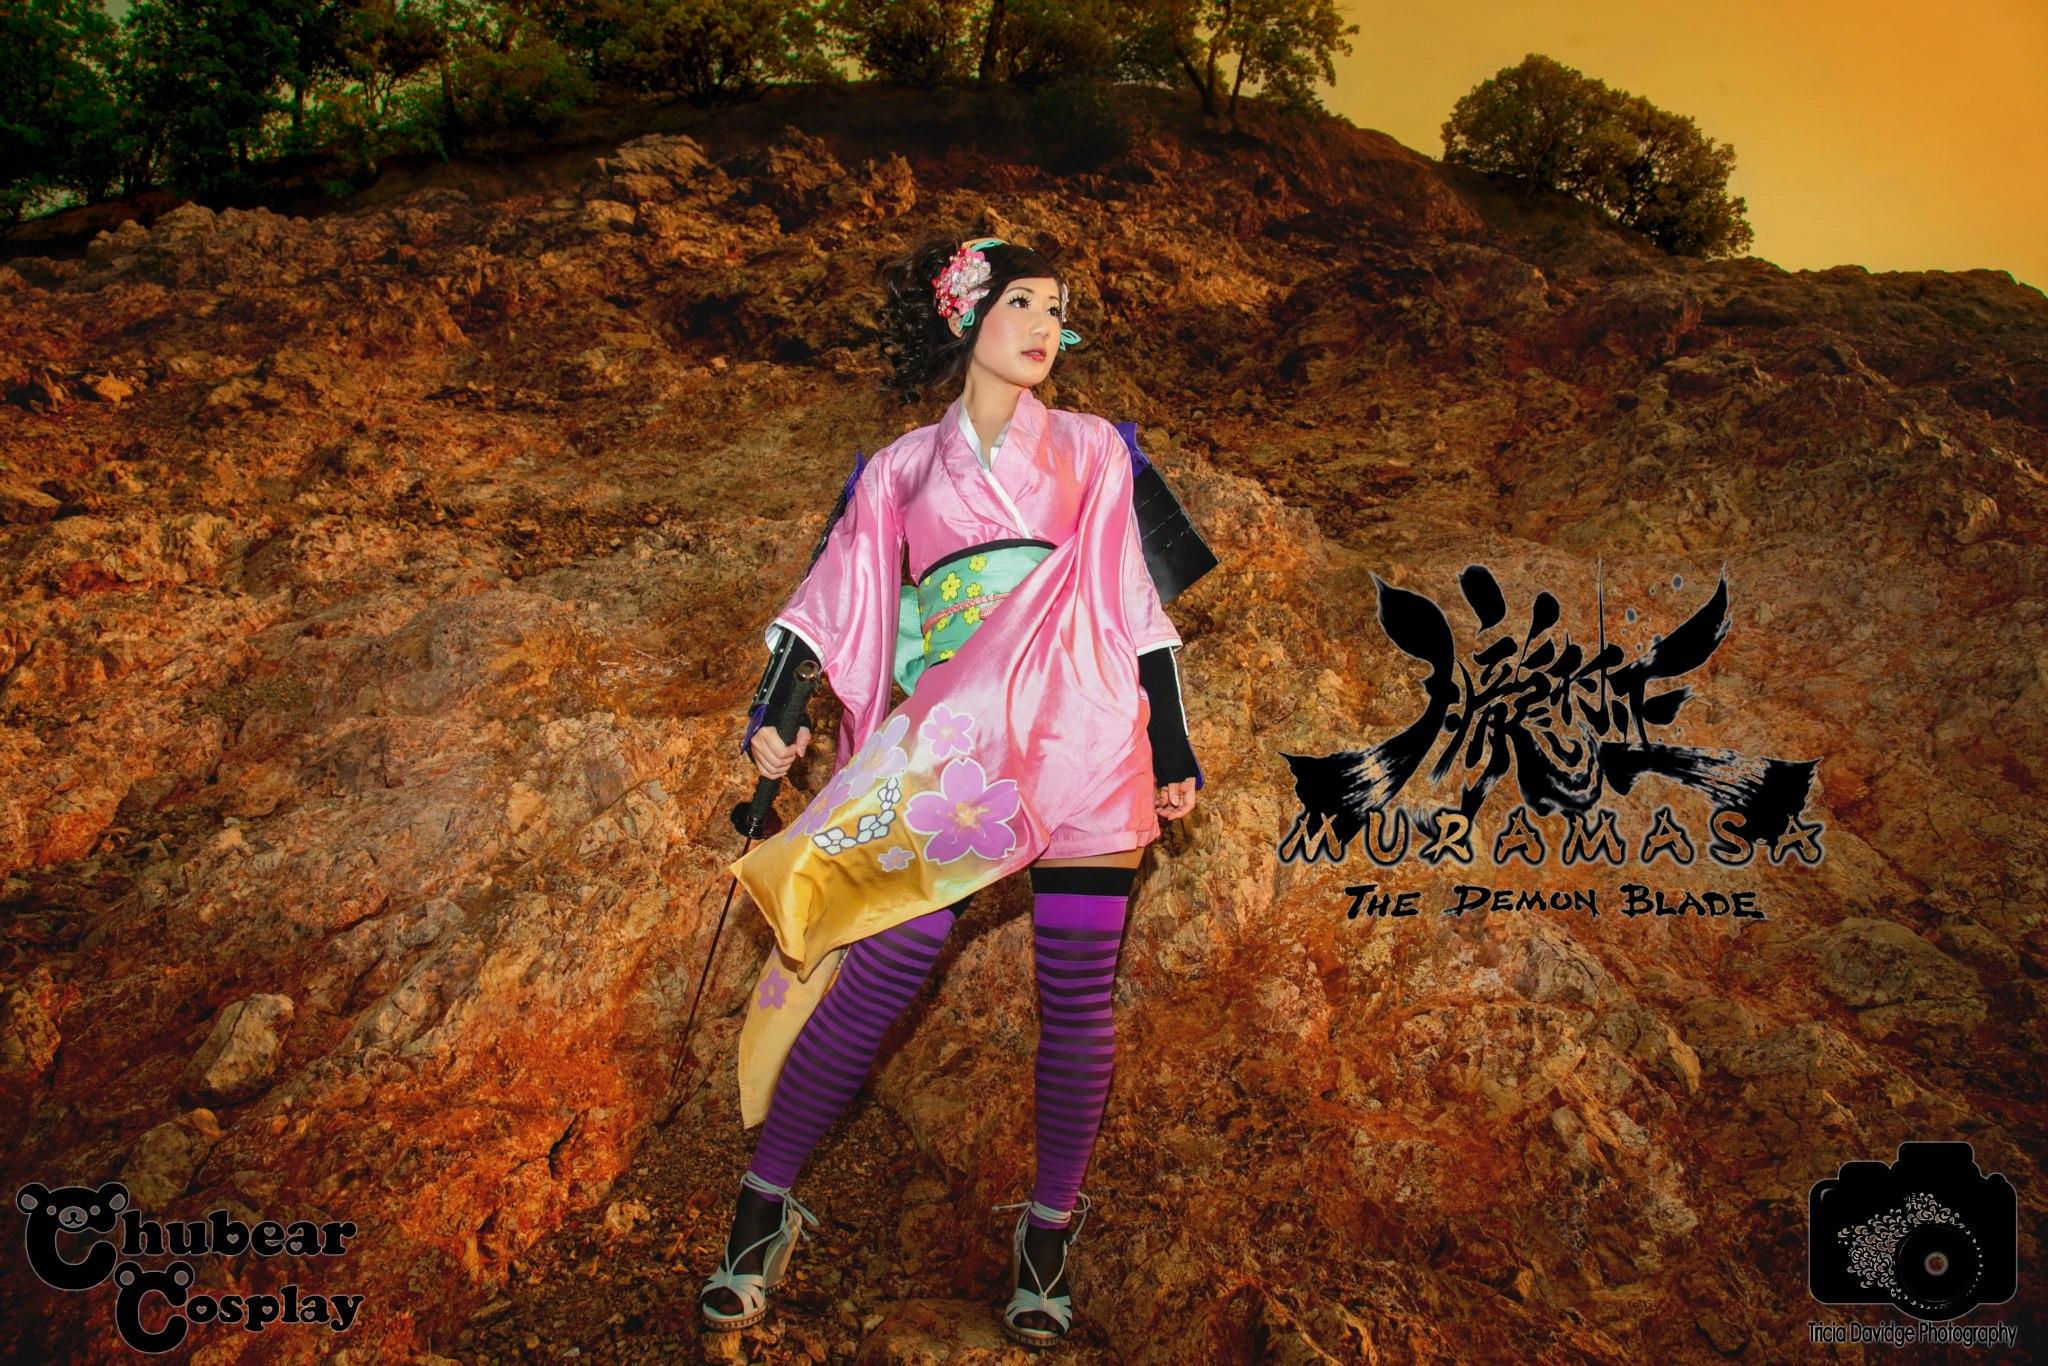 Muramasa The Demon Blade - Momohime